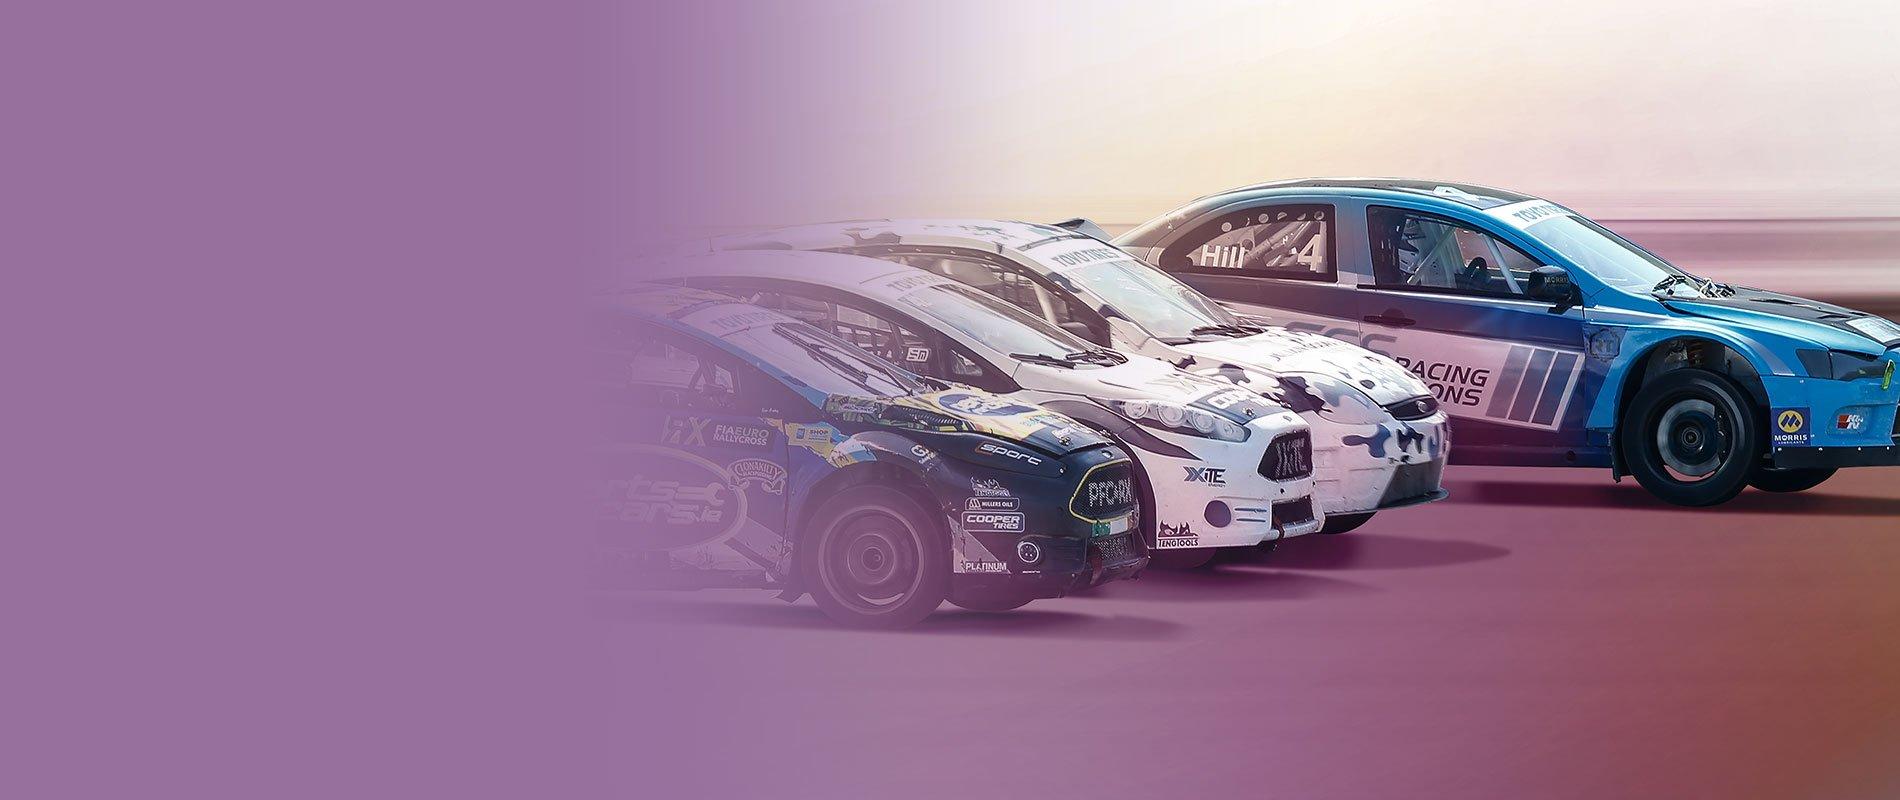 5 Nations British Rallycross Championship